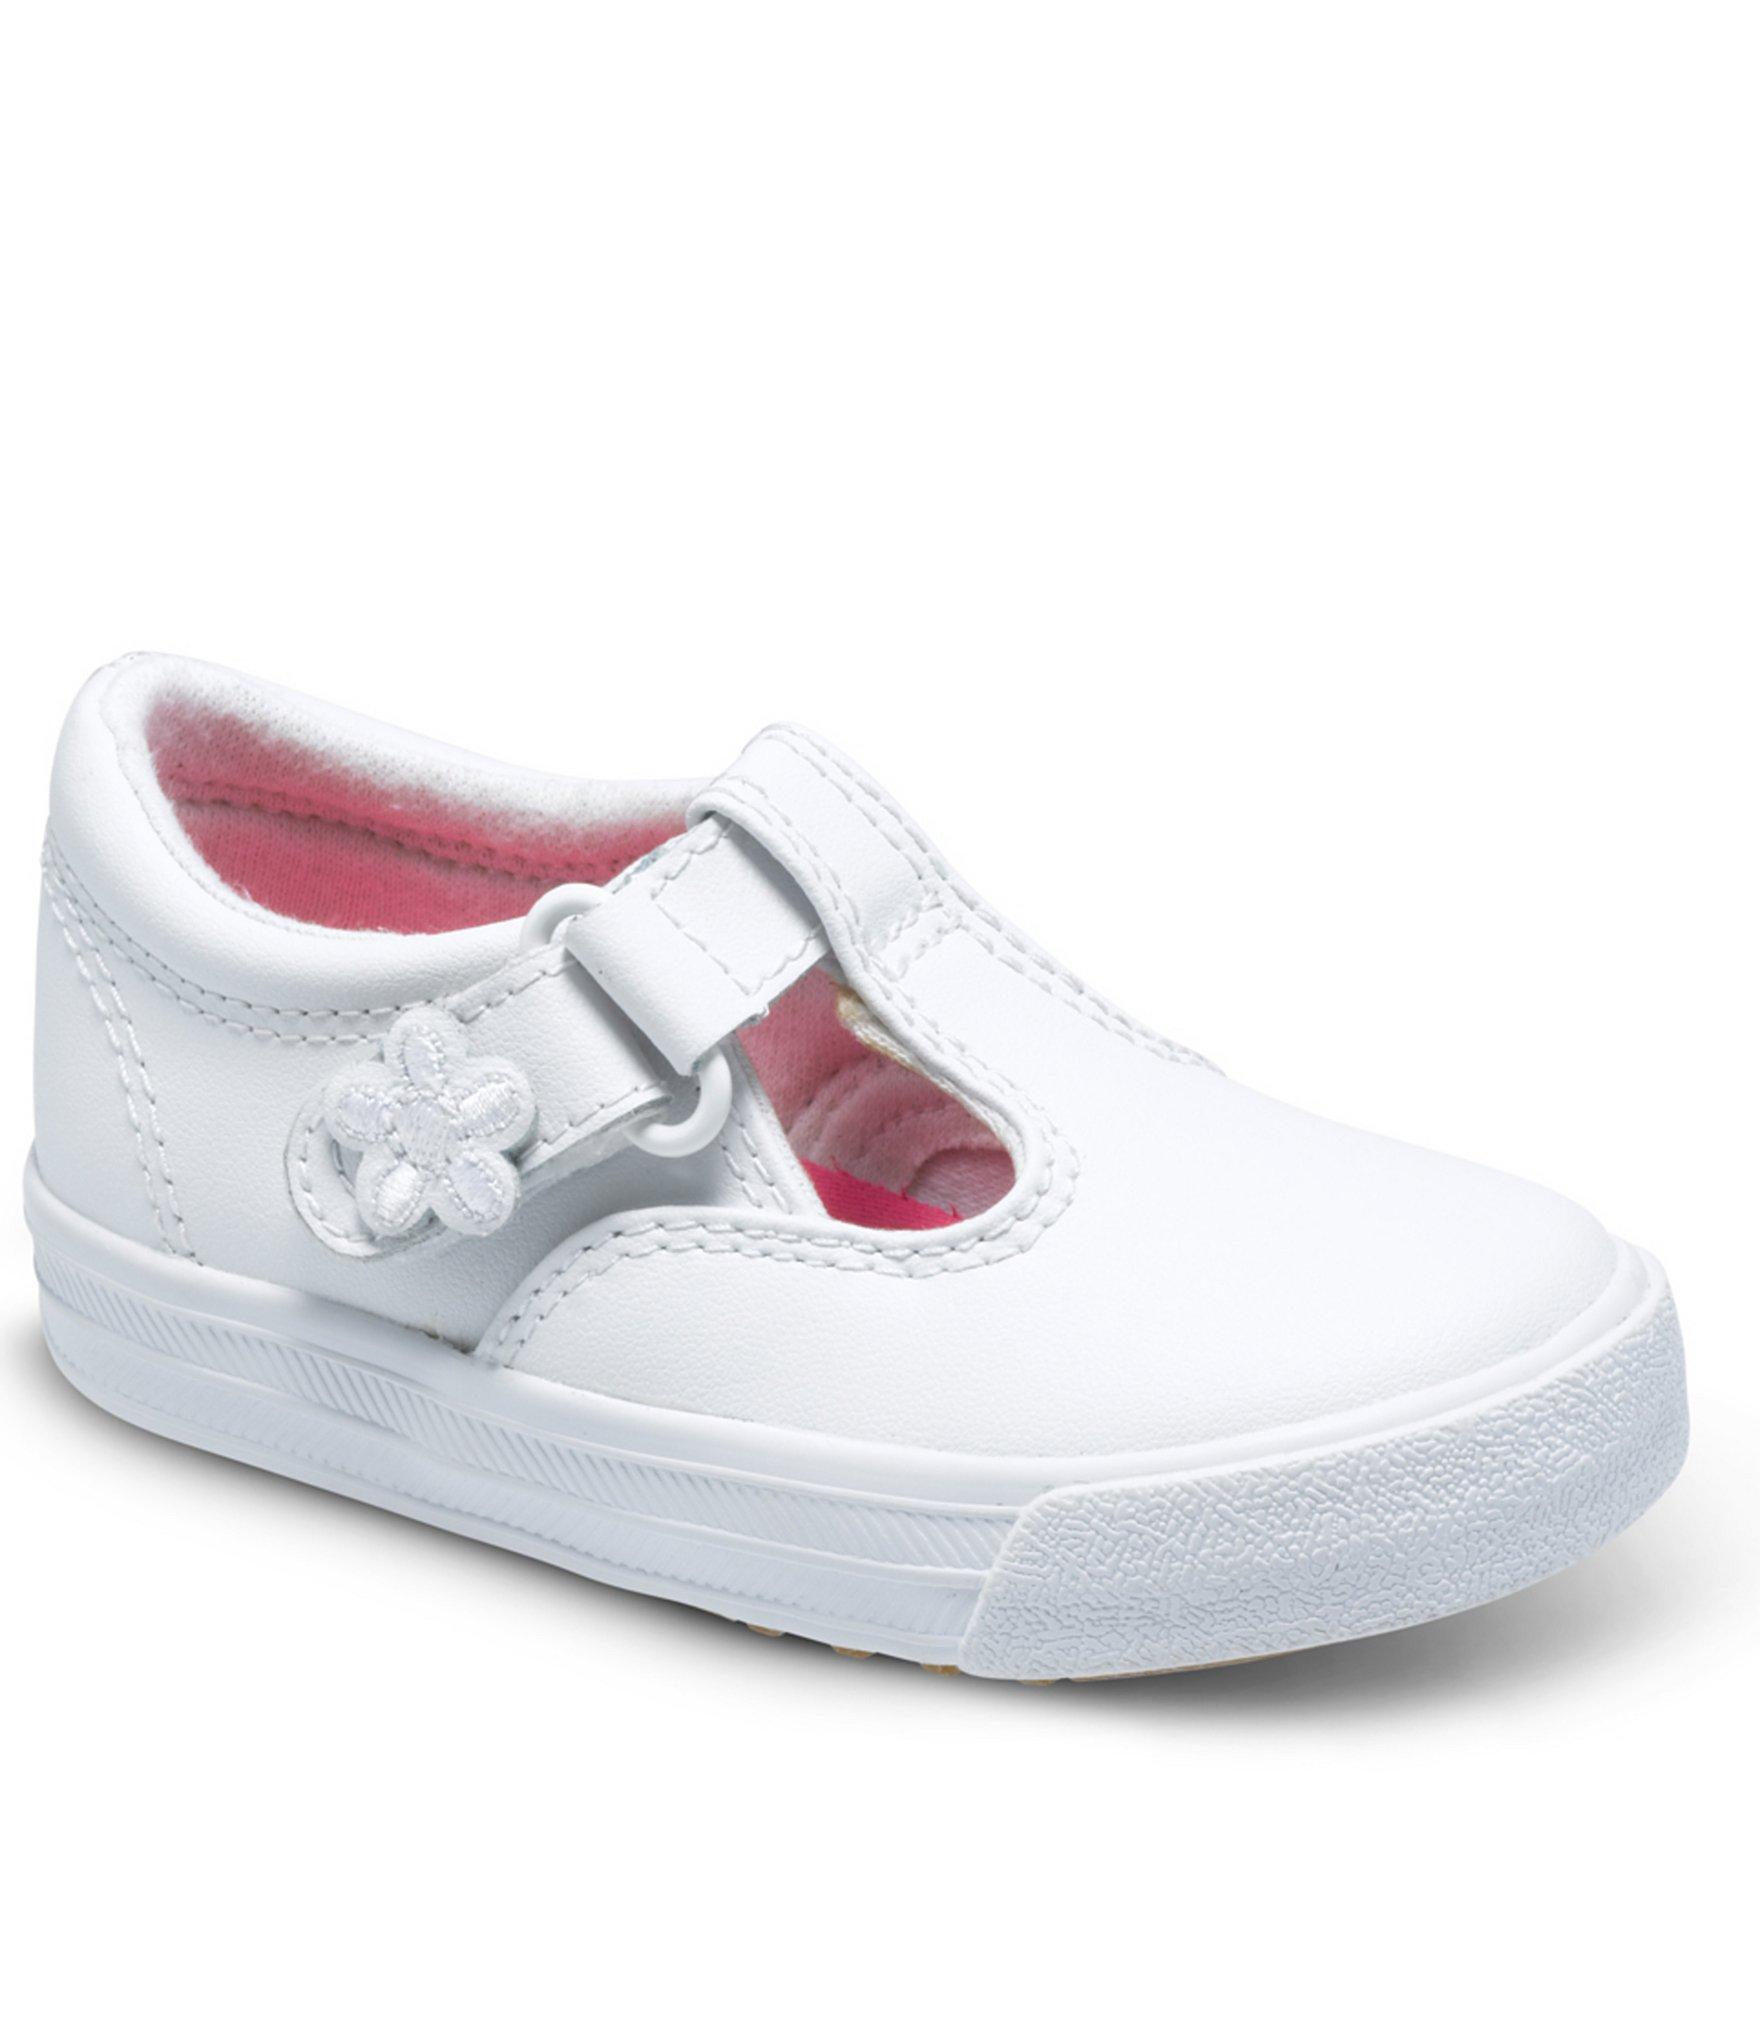 17f279c4de5 Kids Keds Girls Daphne Leather Low Top Lace Up Walking